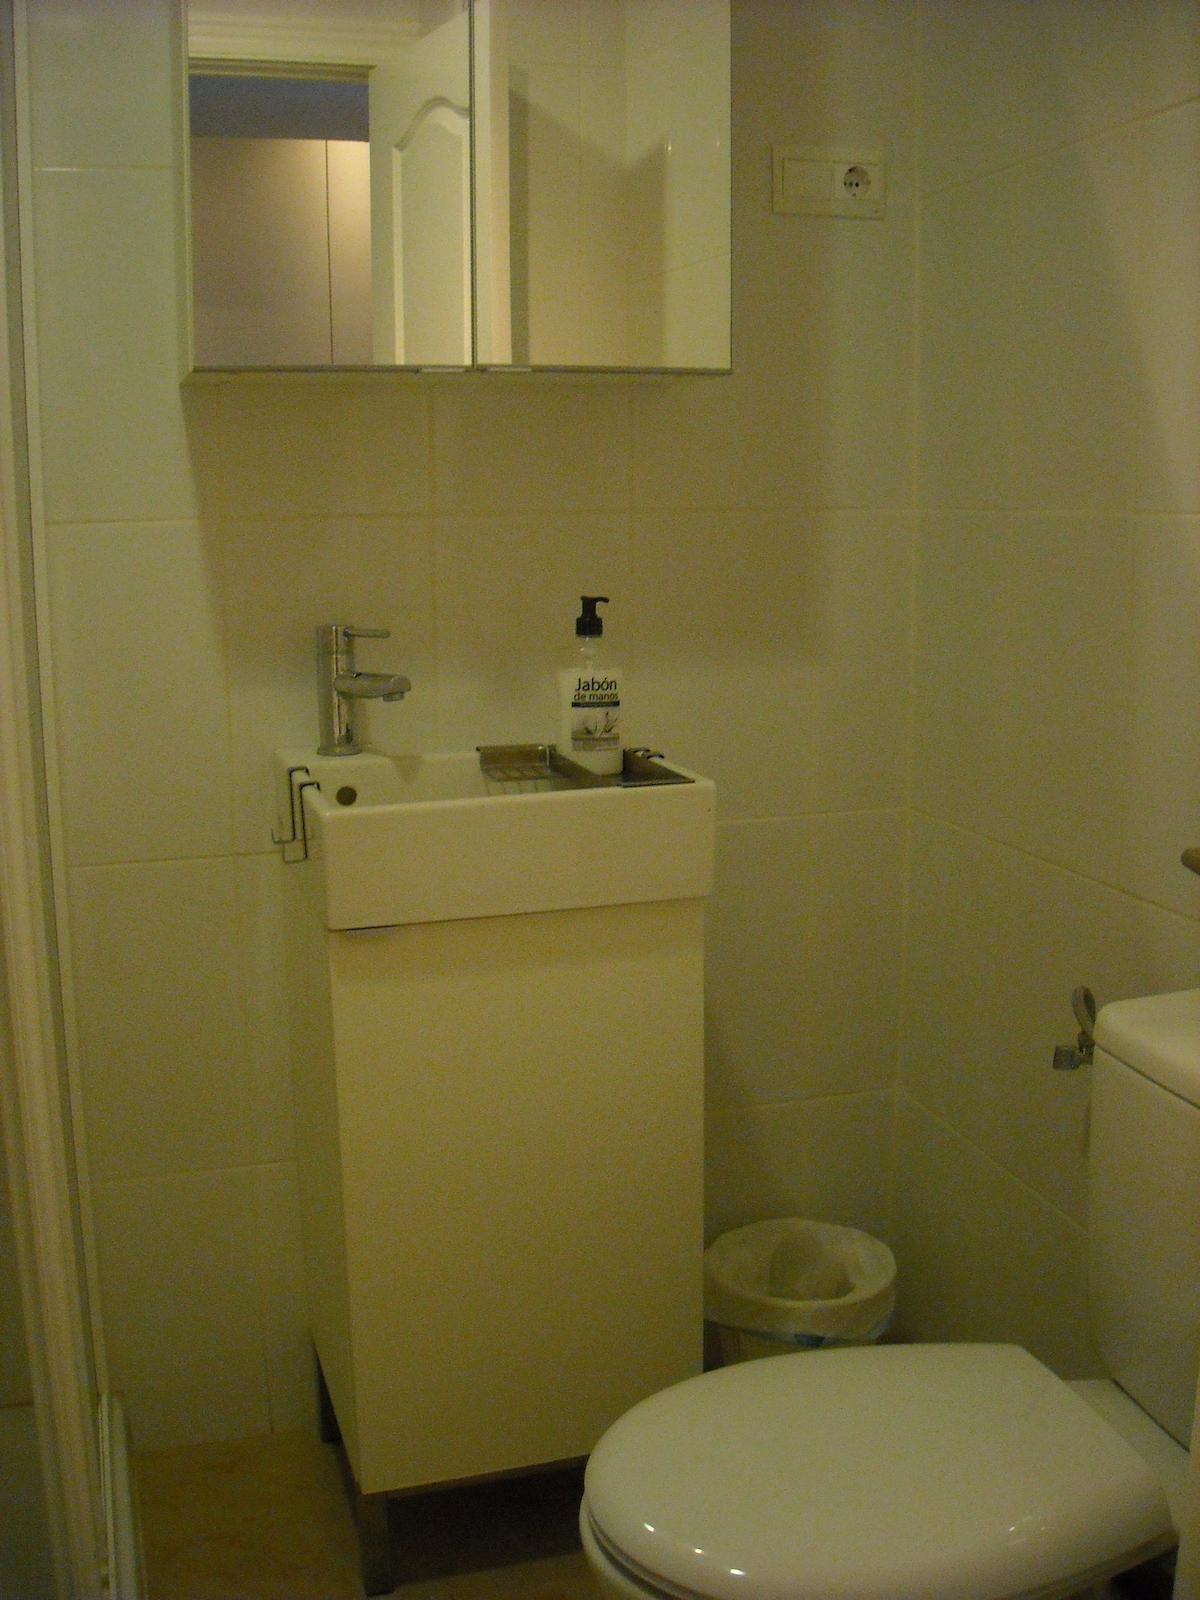 Bath room  -                                                                                                                                                                 Badeværelse